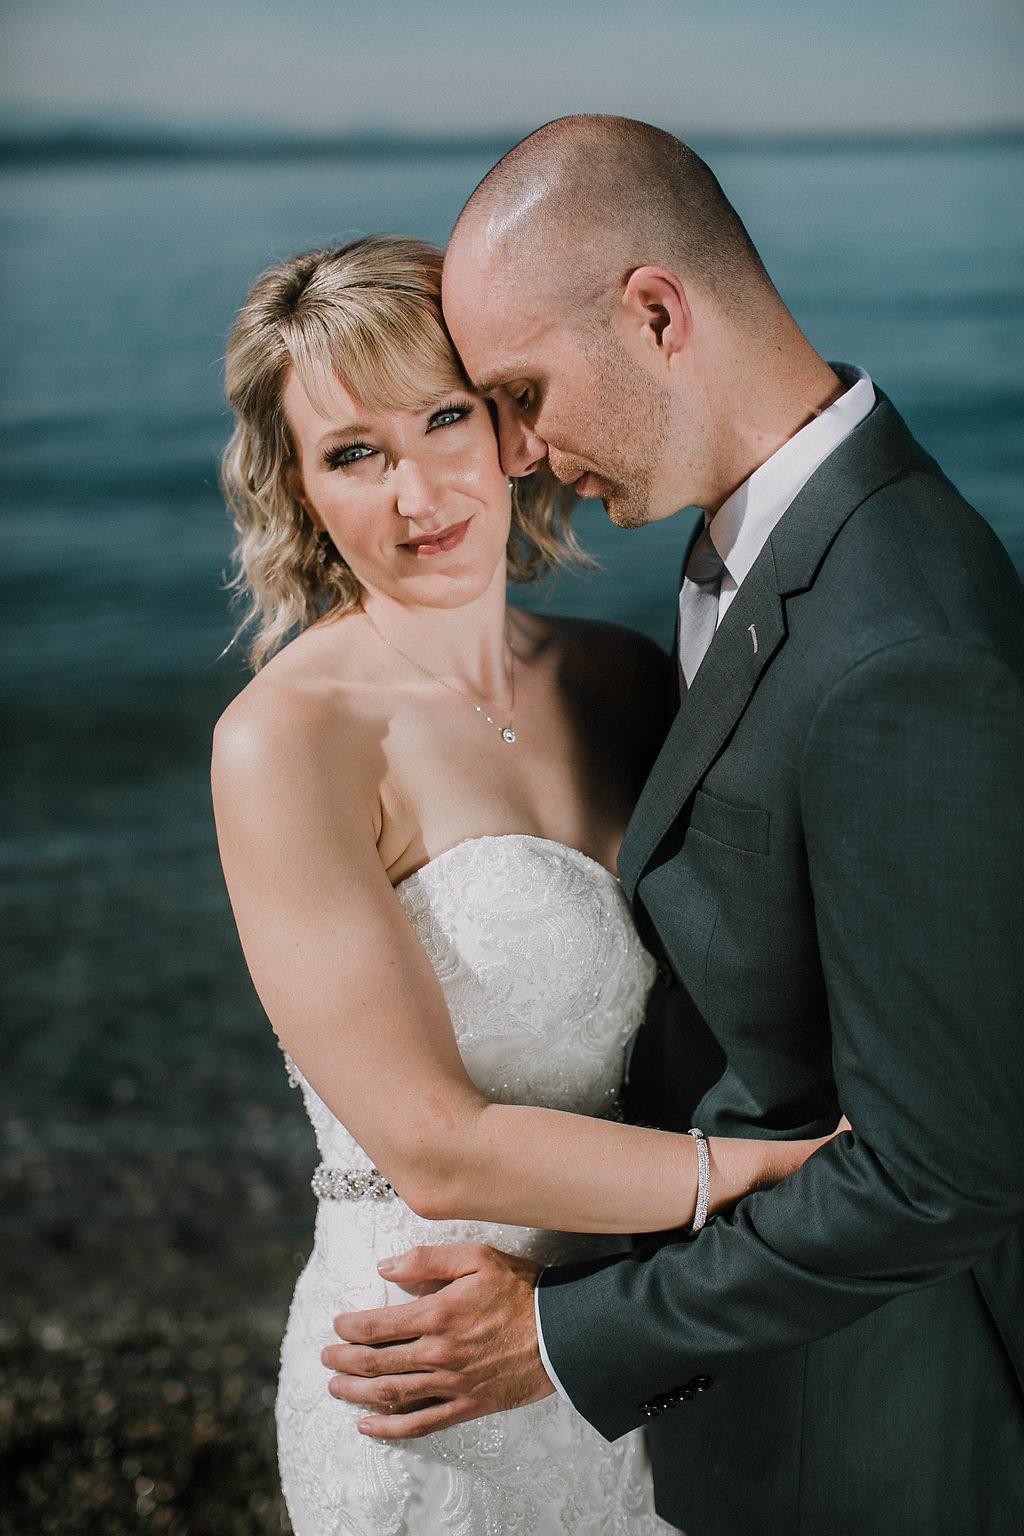 Amy+Clint_Within_Sodo_wedding_seattle_by_Adina_Preston_Weddings_45.JPG